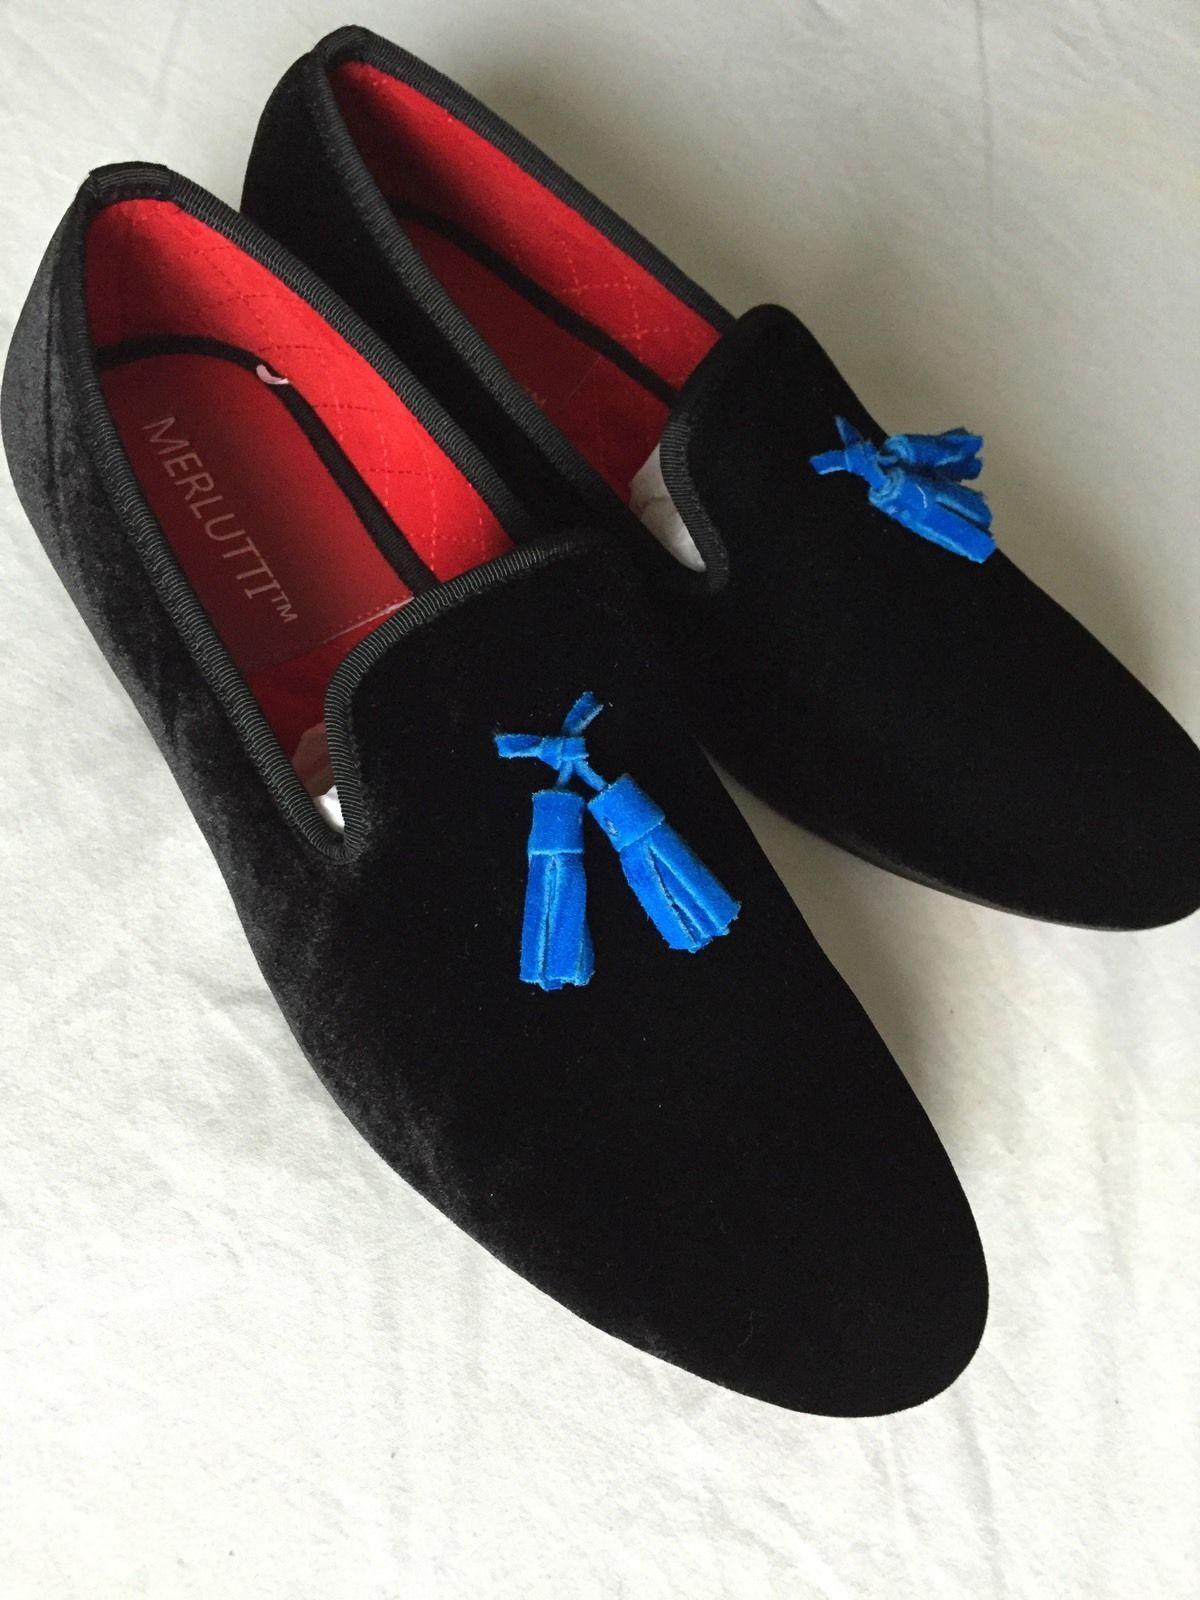 64269cf937b Merlutti Black Velvet With Gold Copper Buckle Men s Shoes